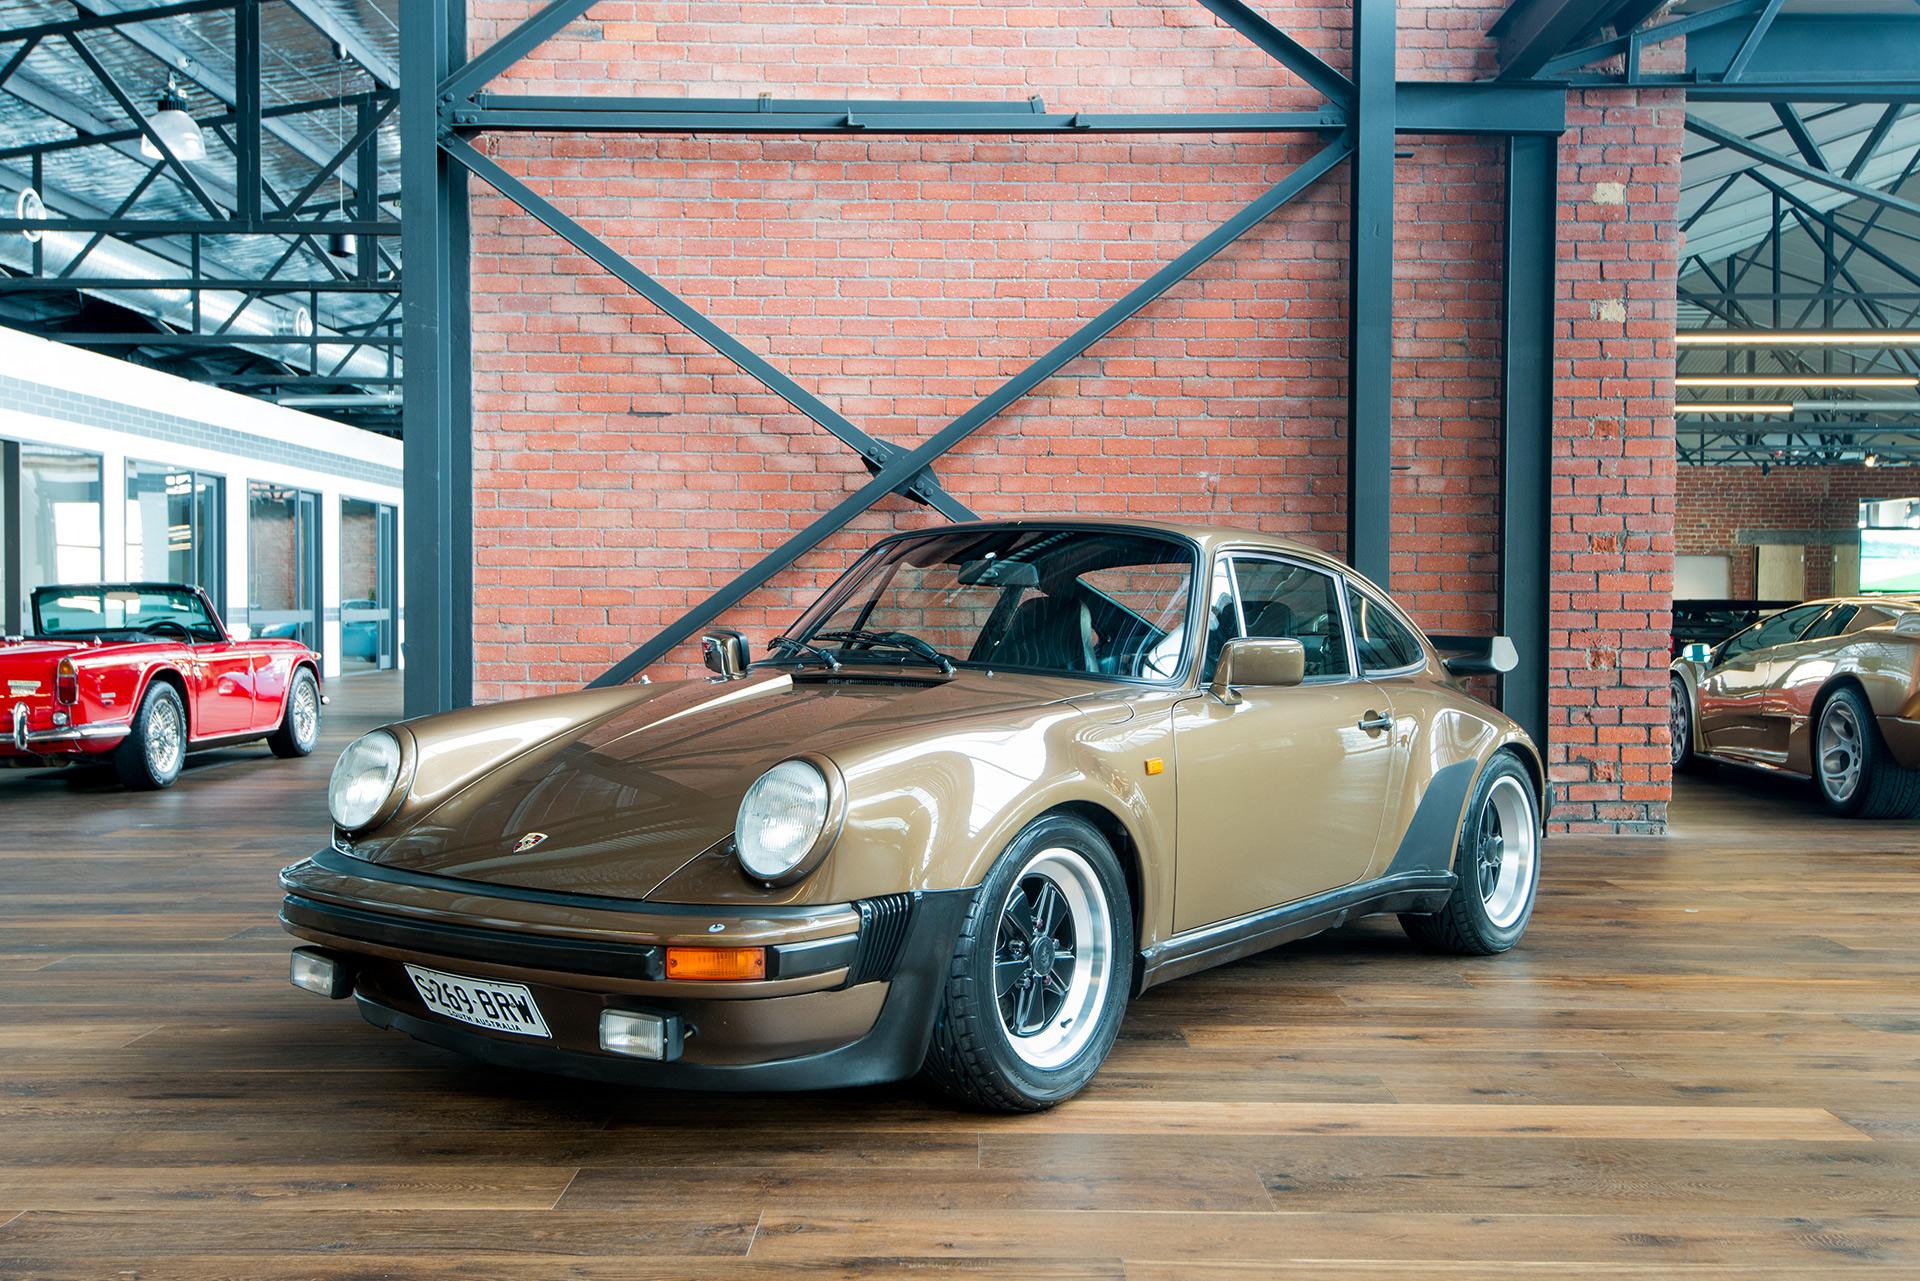 1980 Porsche 930 Turbo Richmonds Classic And Prestige Cars Storage And Sales Adelaide Australia